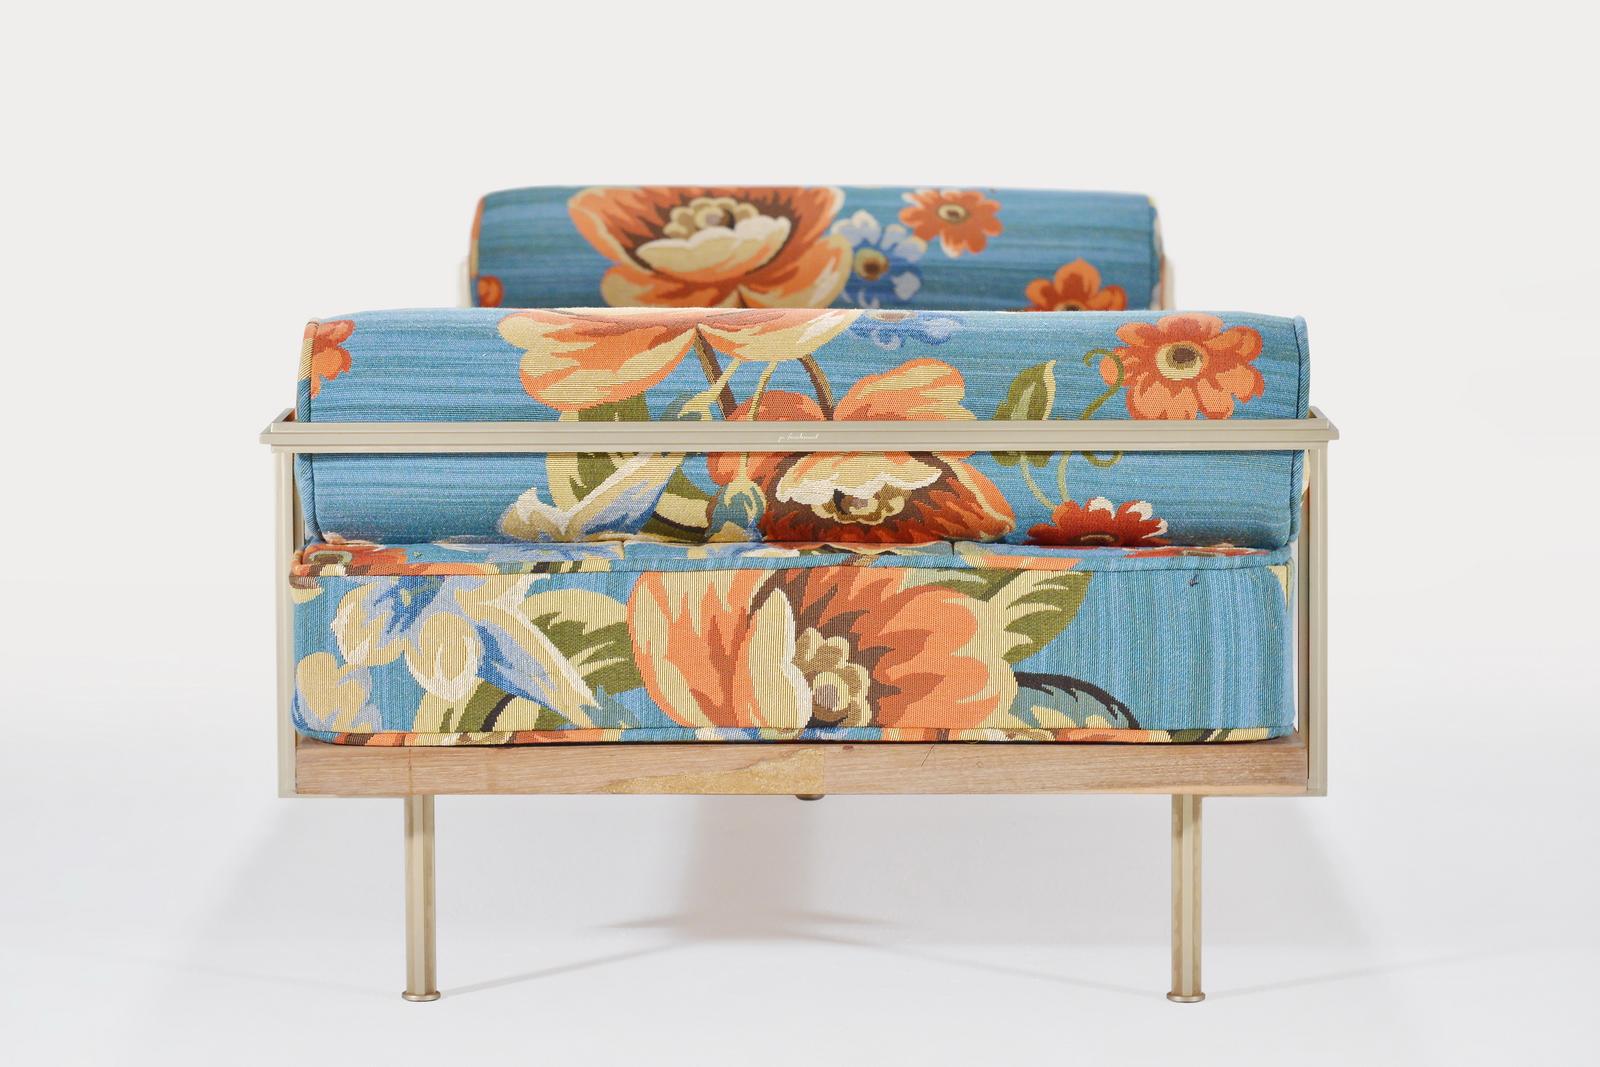 PTendercool-Sofa-PT76-BS1-TE-NO-JD&CO (Garden Tapestry)-190903-04